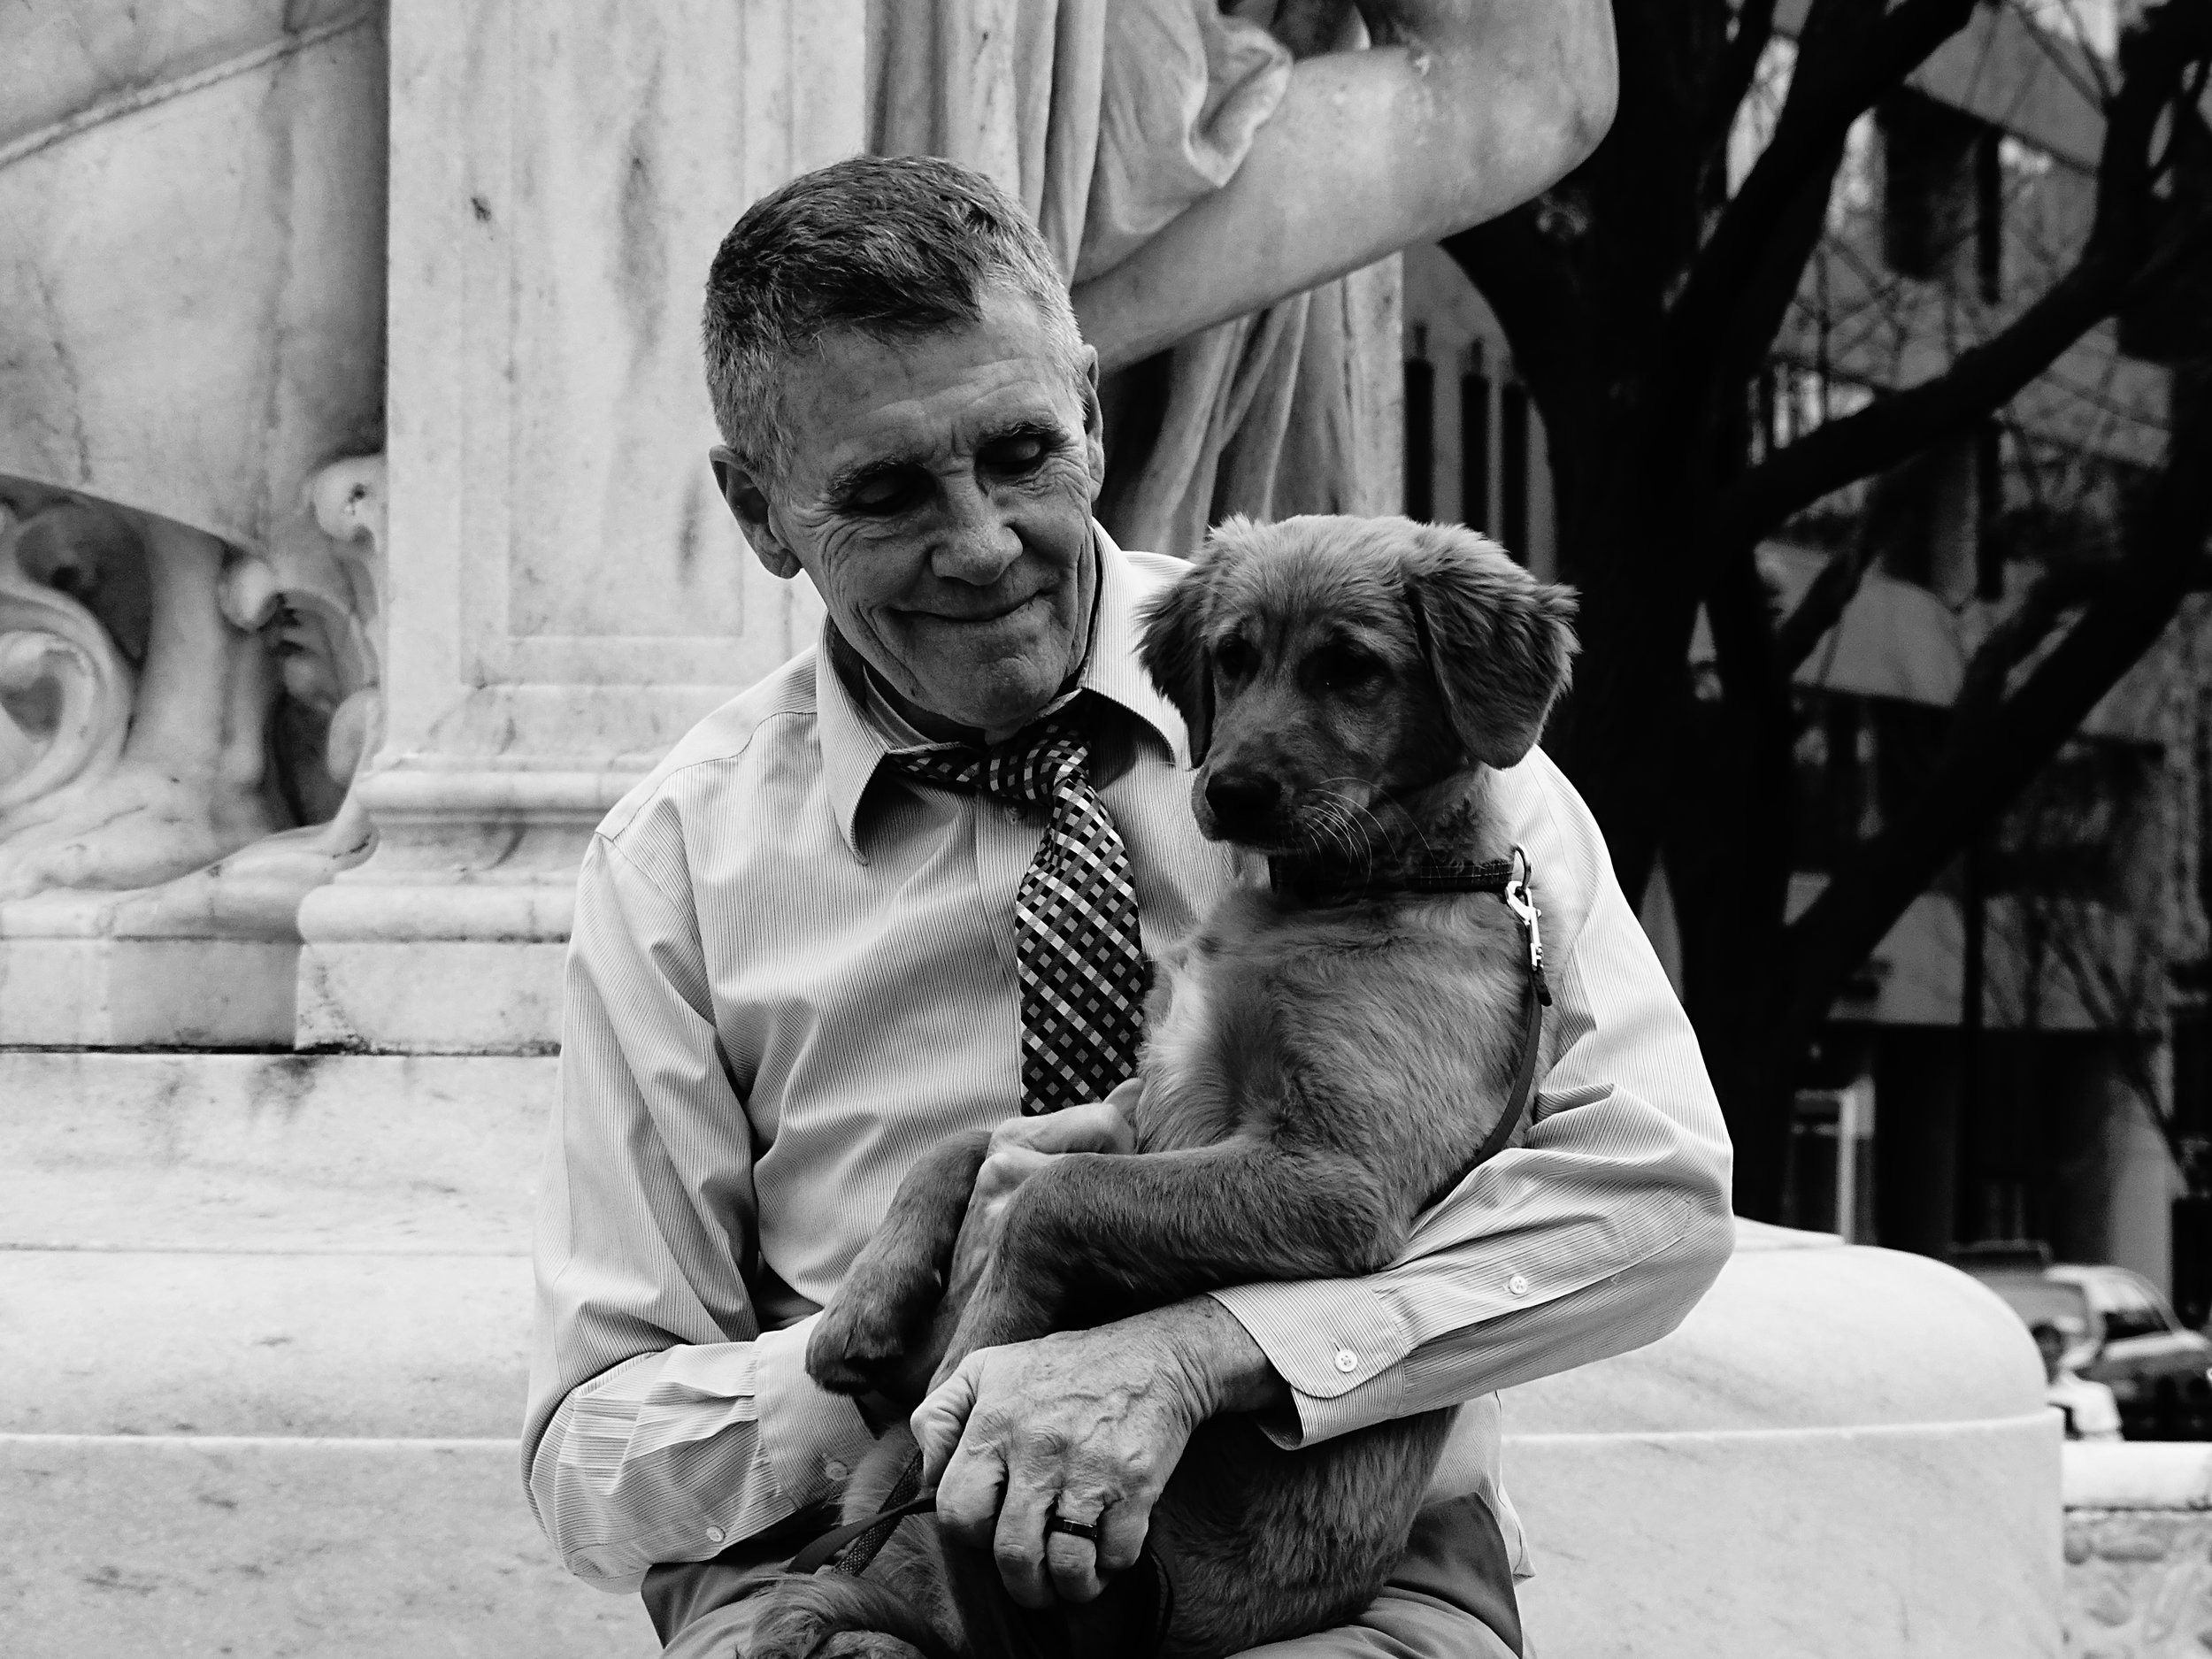 Man and Dog, Washington, DC 2016